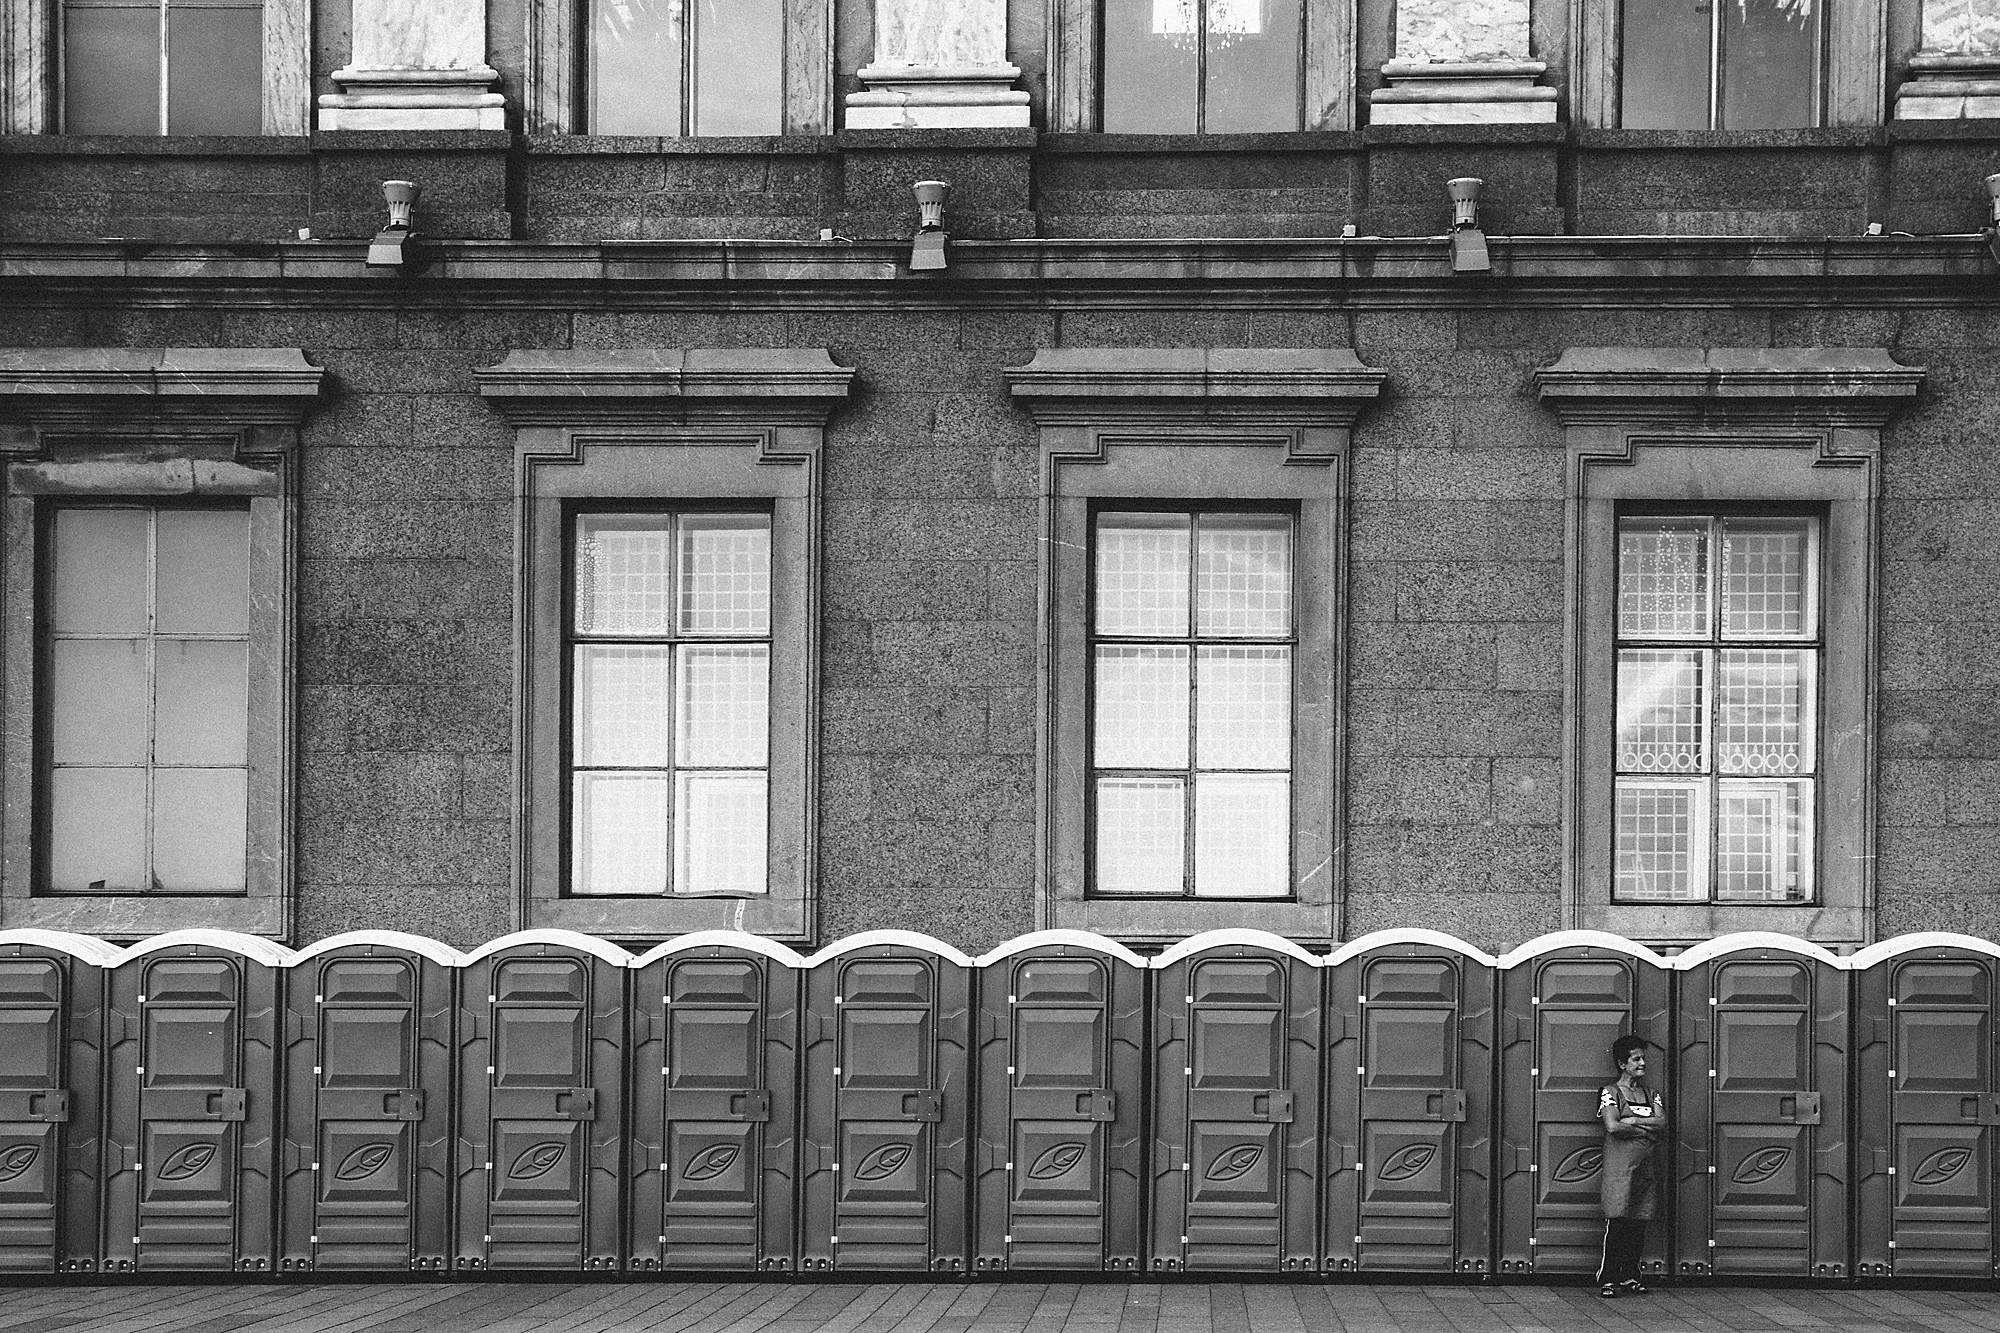 Хранительница туалетов